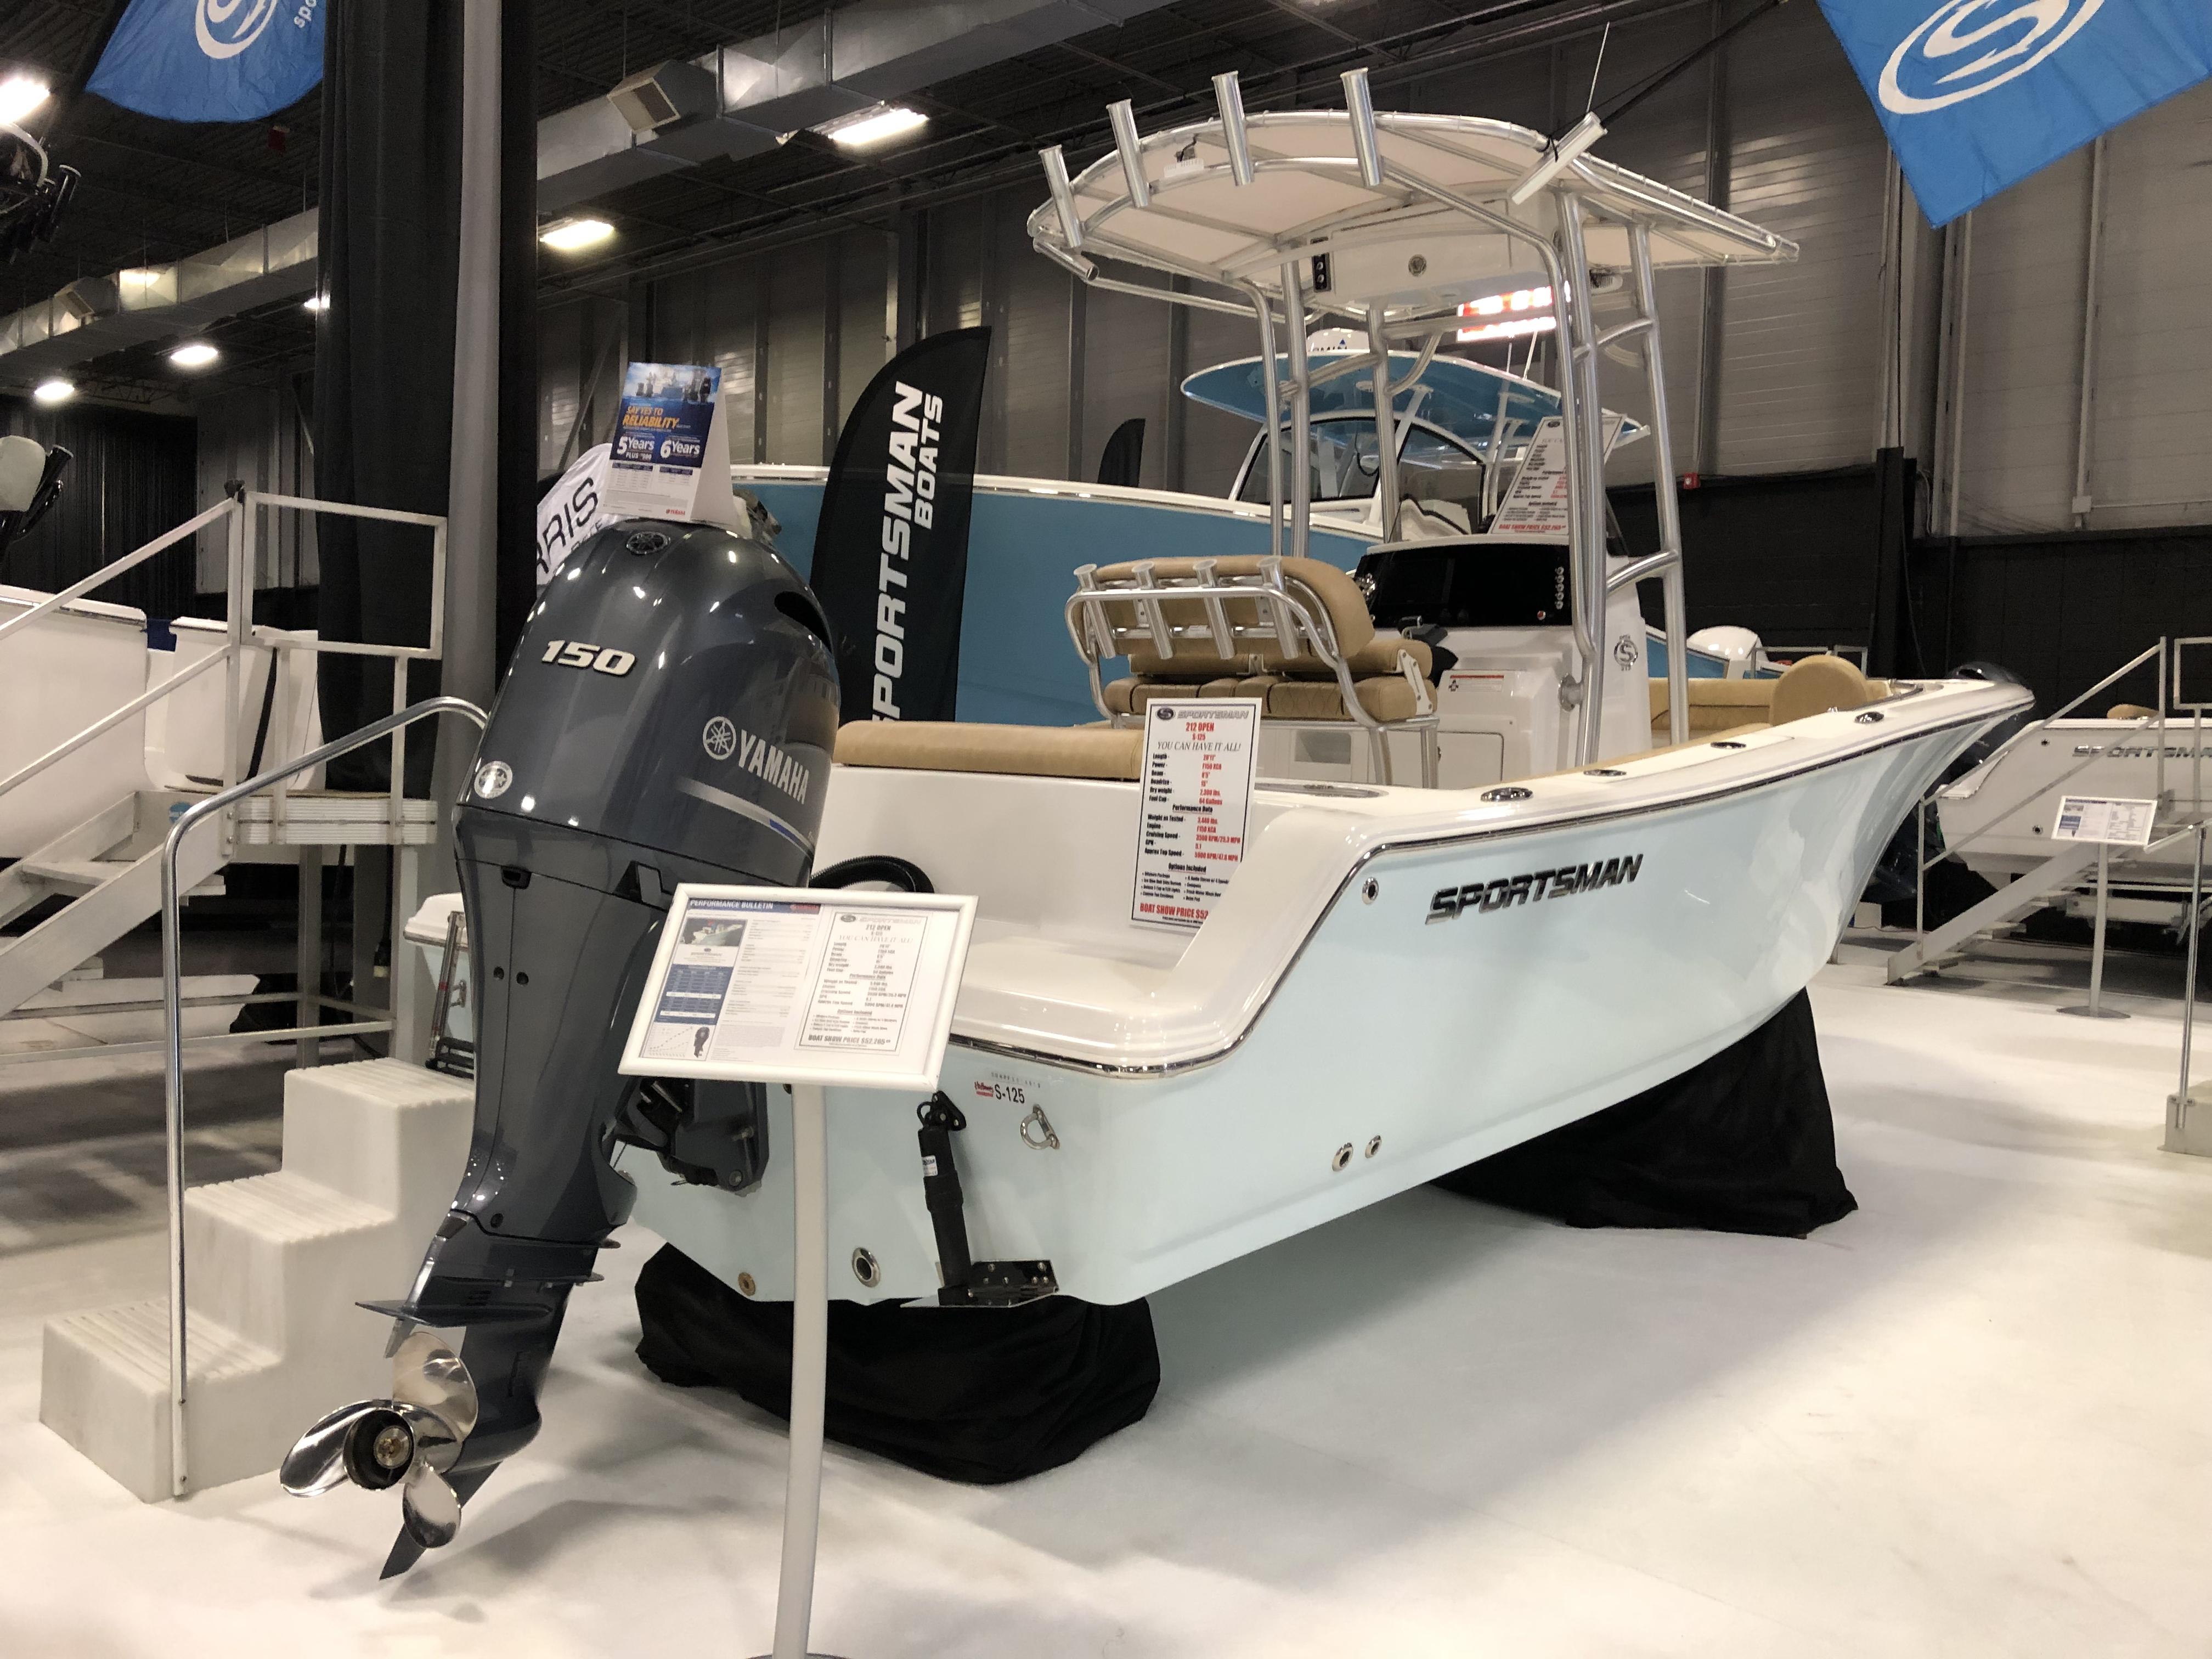 New 2019 SPORTSMAN 212 open, Brielle, Nj - 08730 - Boat Trader